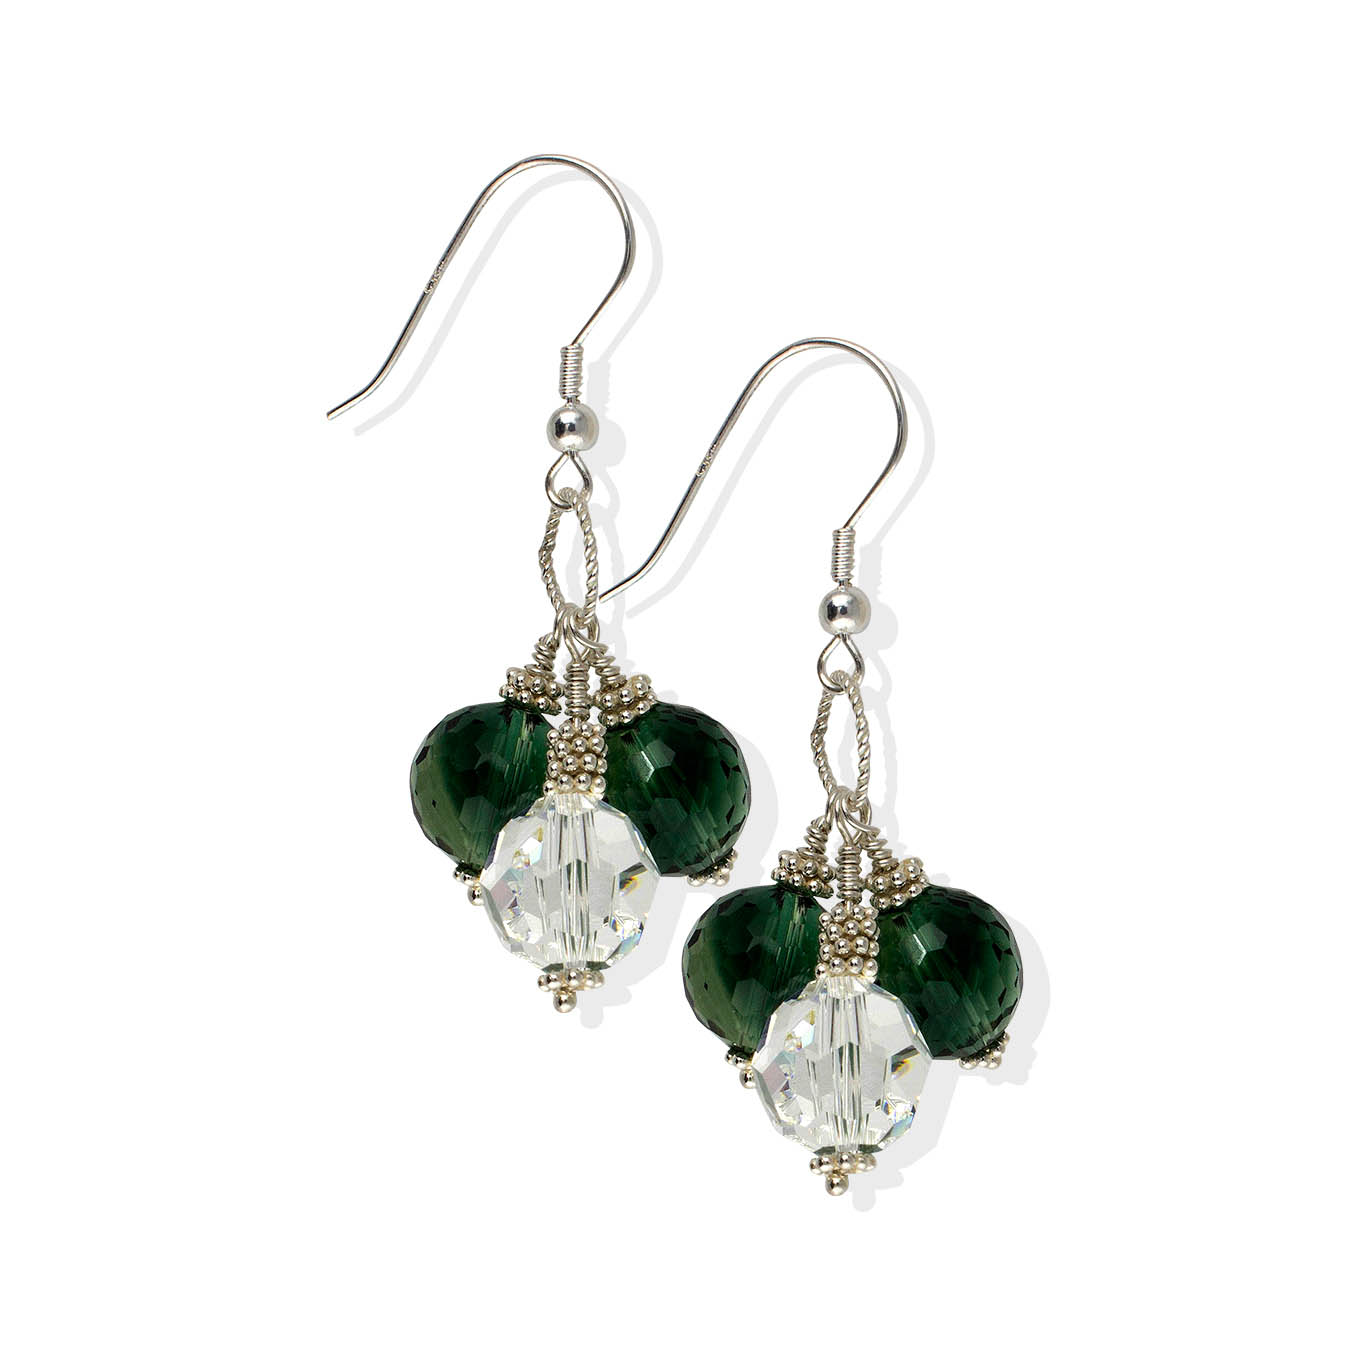 Handmade jewelry necklace made of green quartz, swarovski and silver